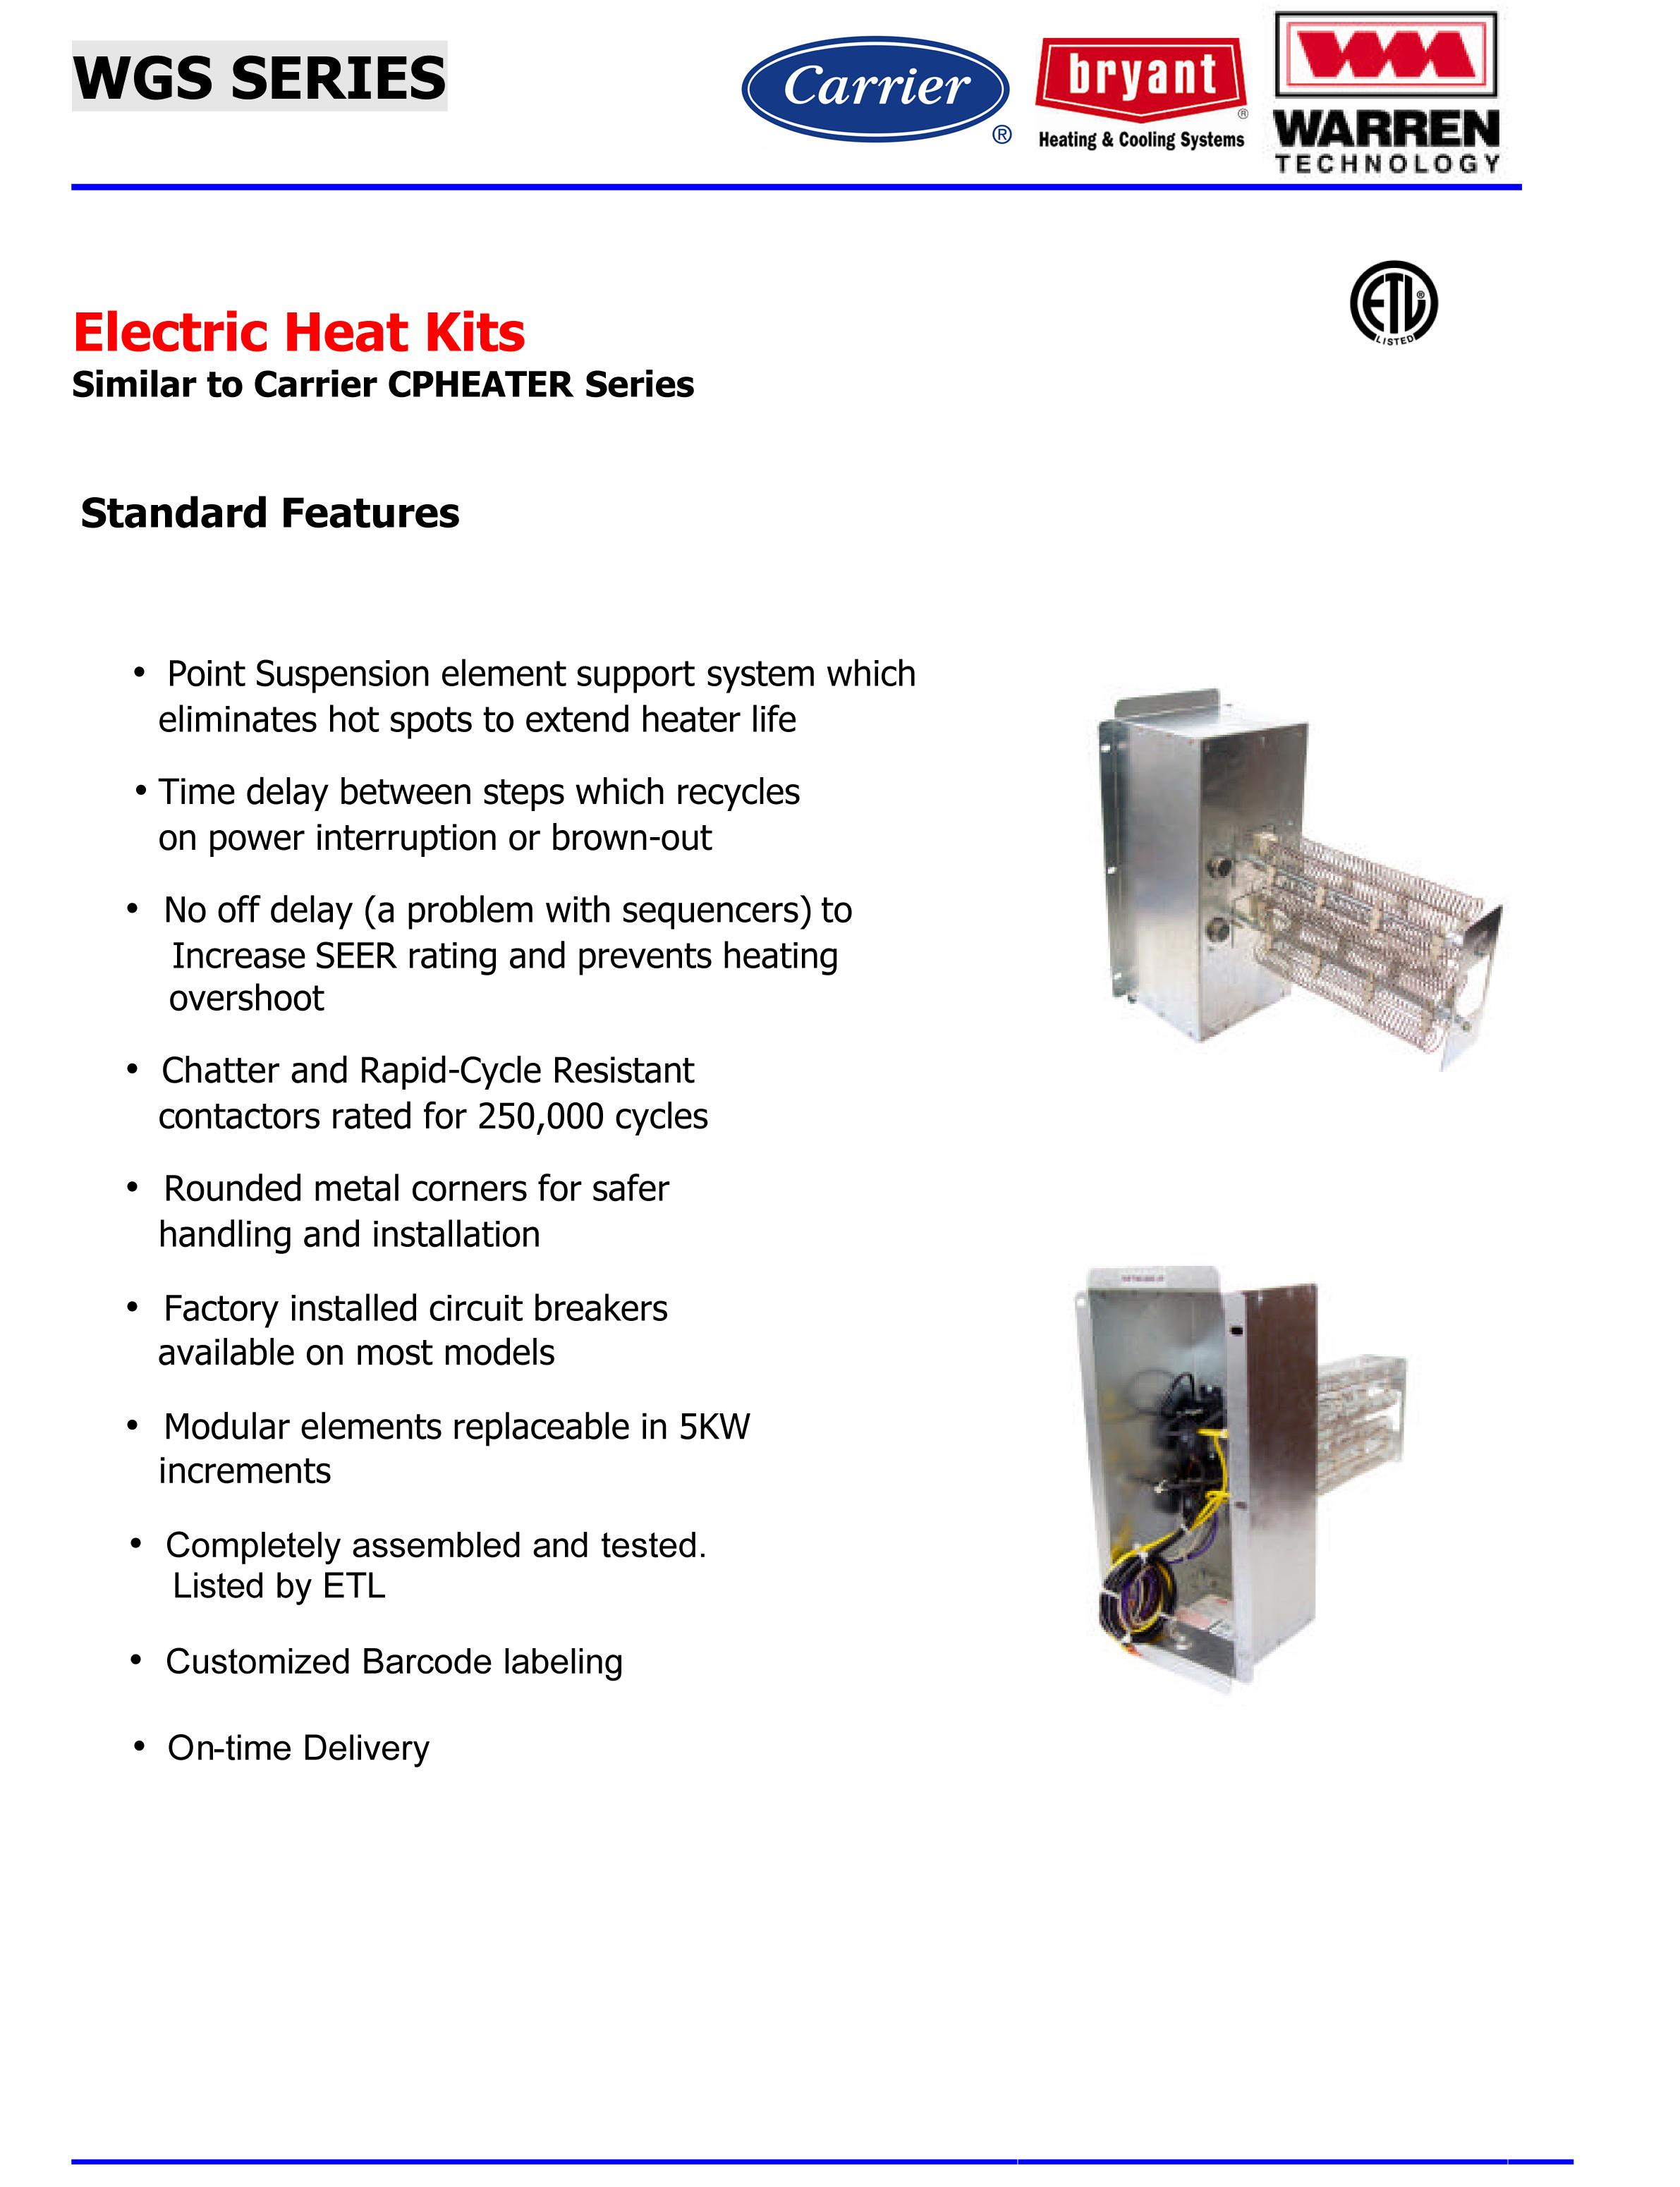 Carrier Bryant Payne WGS HS Brochure?resize=665%2C866&ssl=1 payne heat pump wiring diagram the best wiring diagram 2017 payne heat pump wiring diagram at gsmportal.co